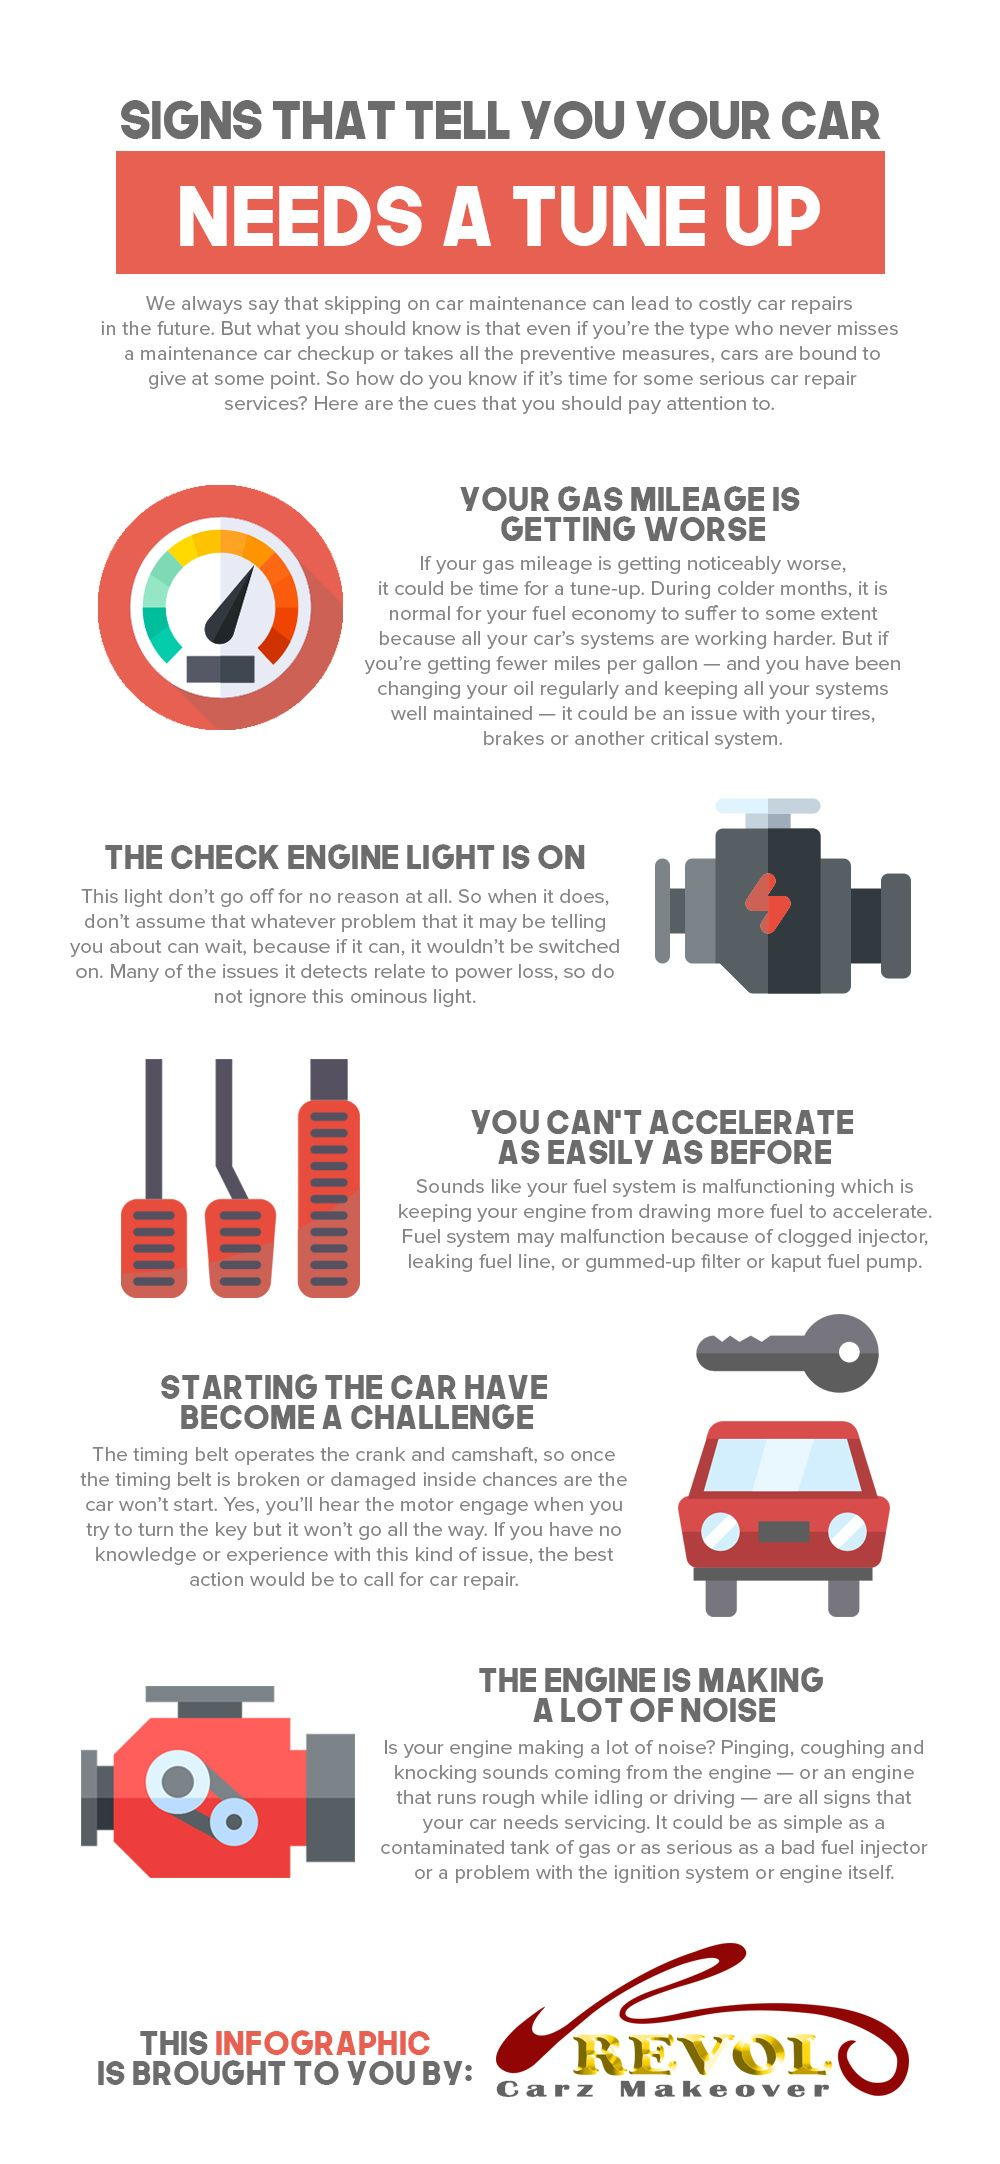 e7a95af7cab3198650b782f6dbd1a49b - How Much Is It To Get Your Car Tuned